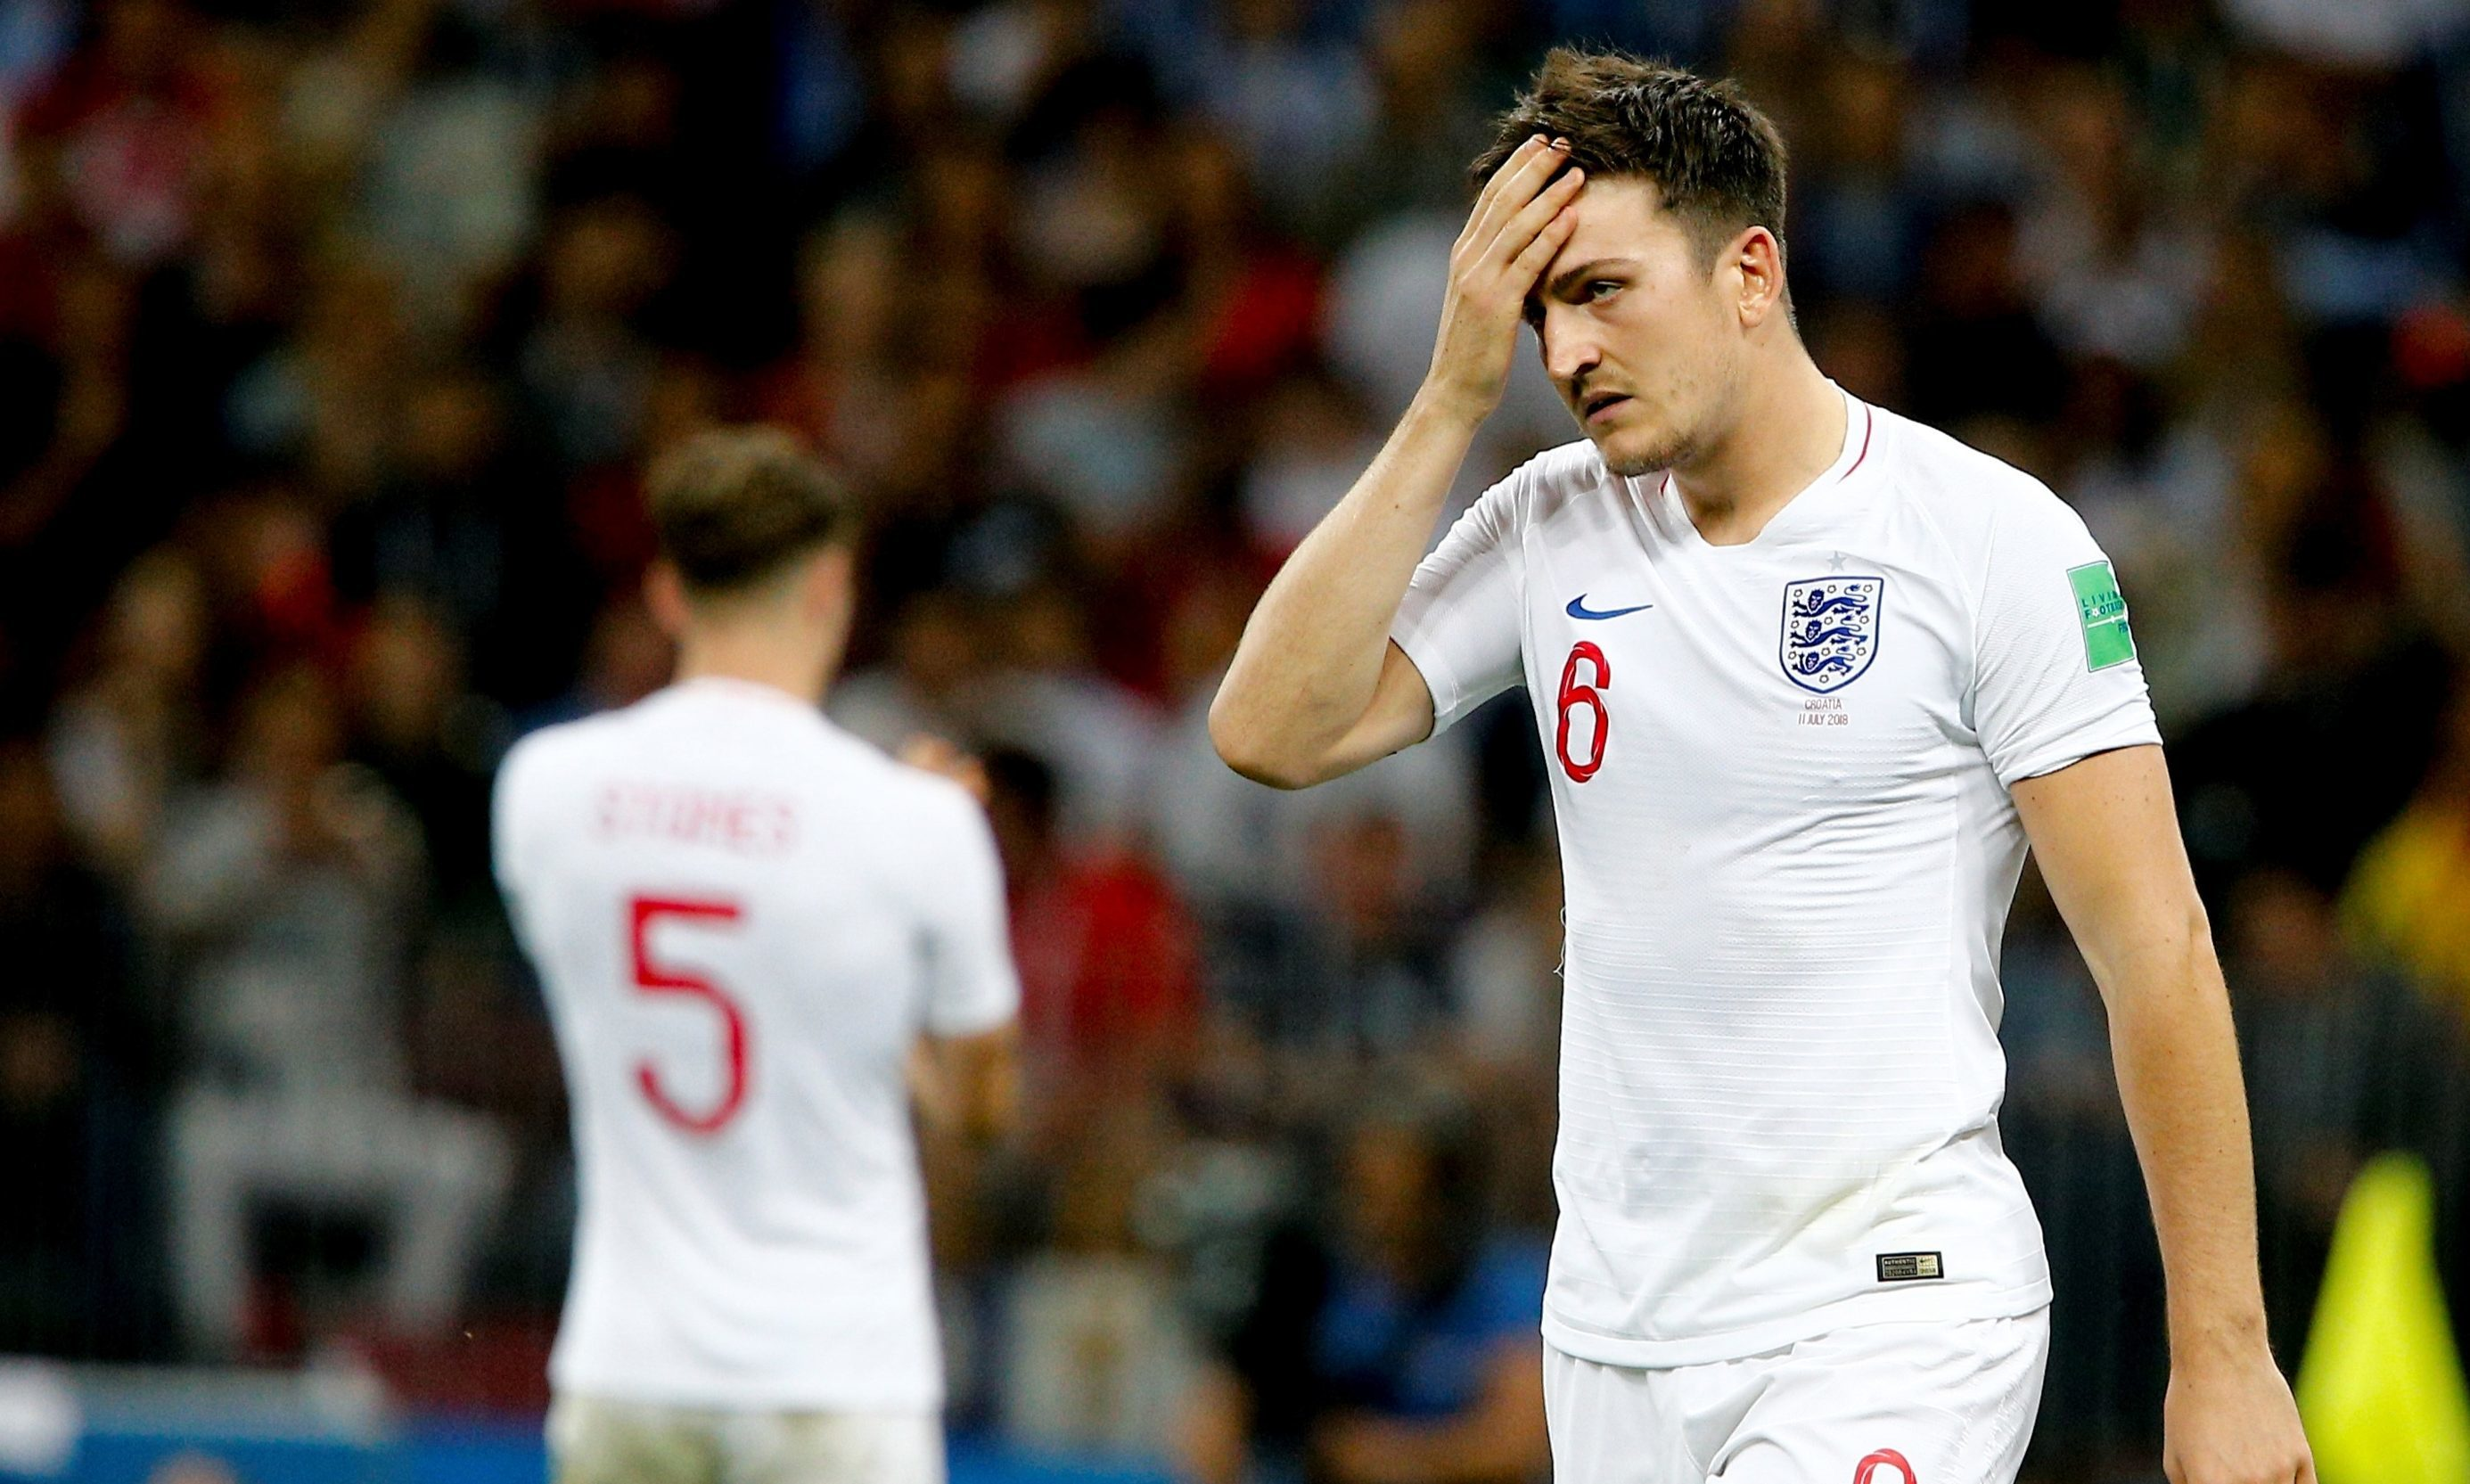 England defenderHarry Maguire (Sefa Karacan/Anadolu Agency/Getty Images)